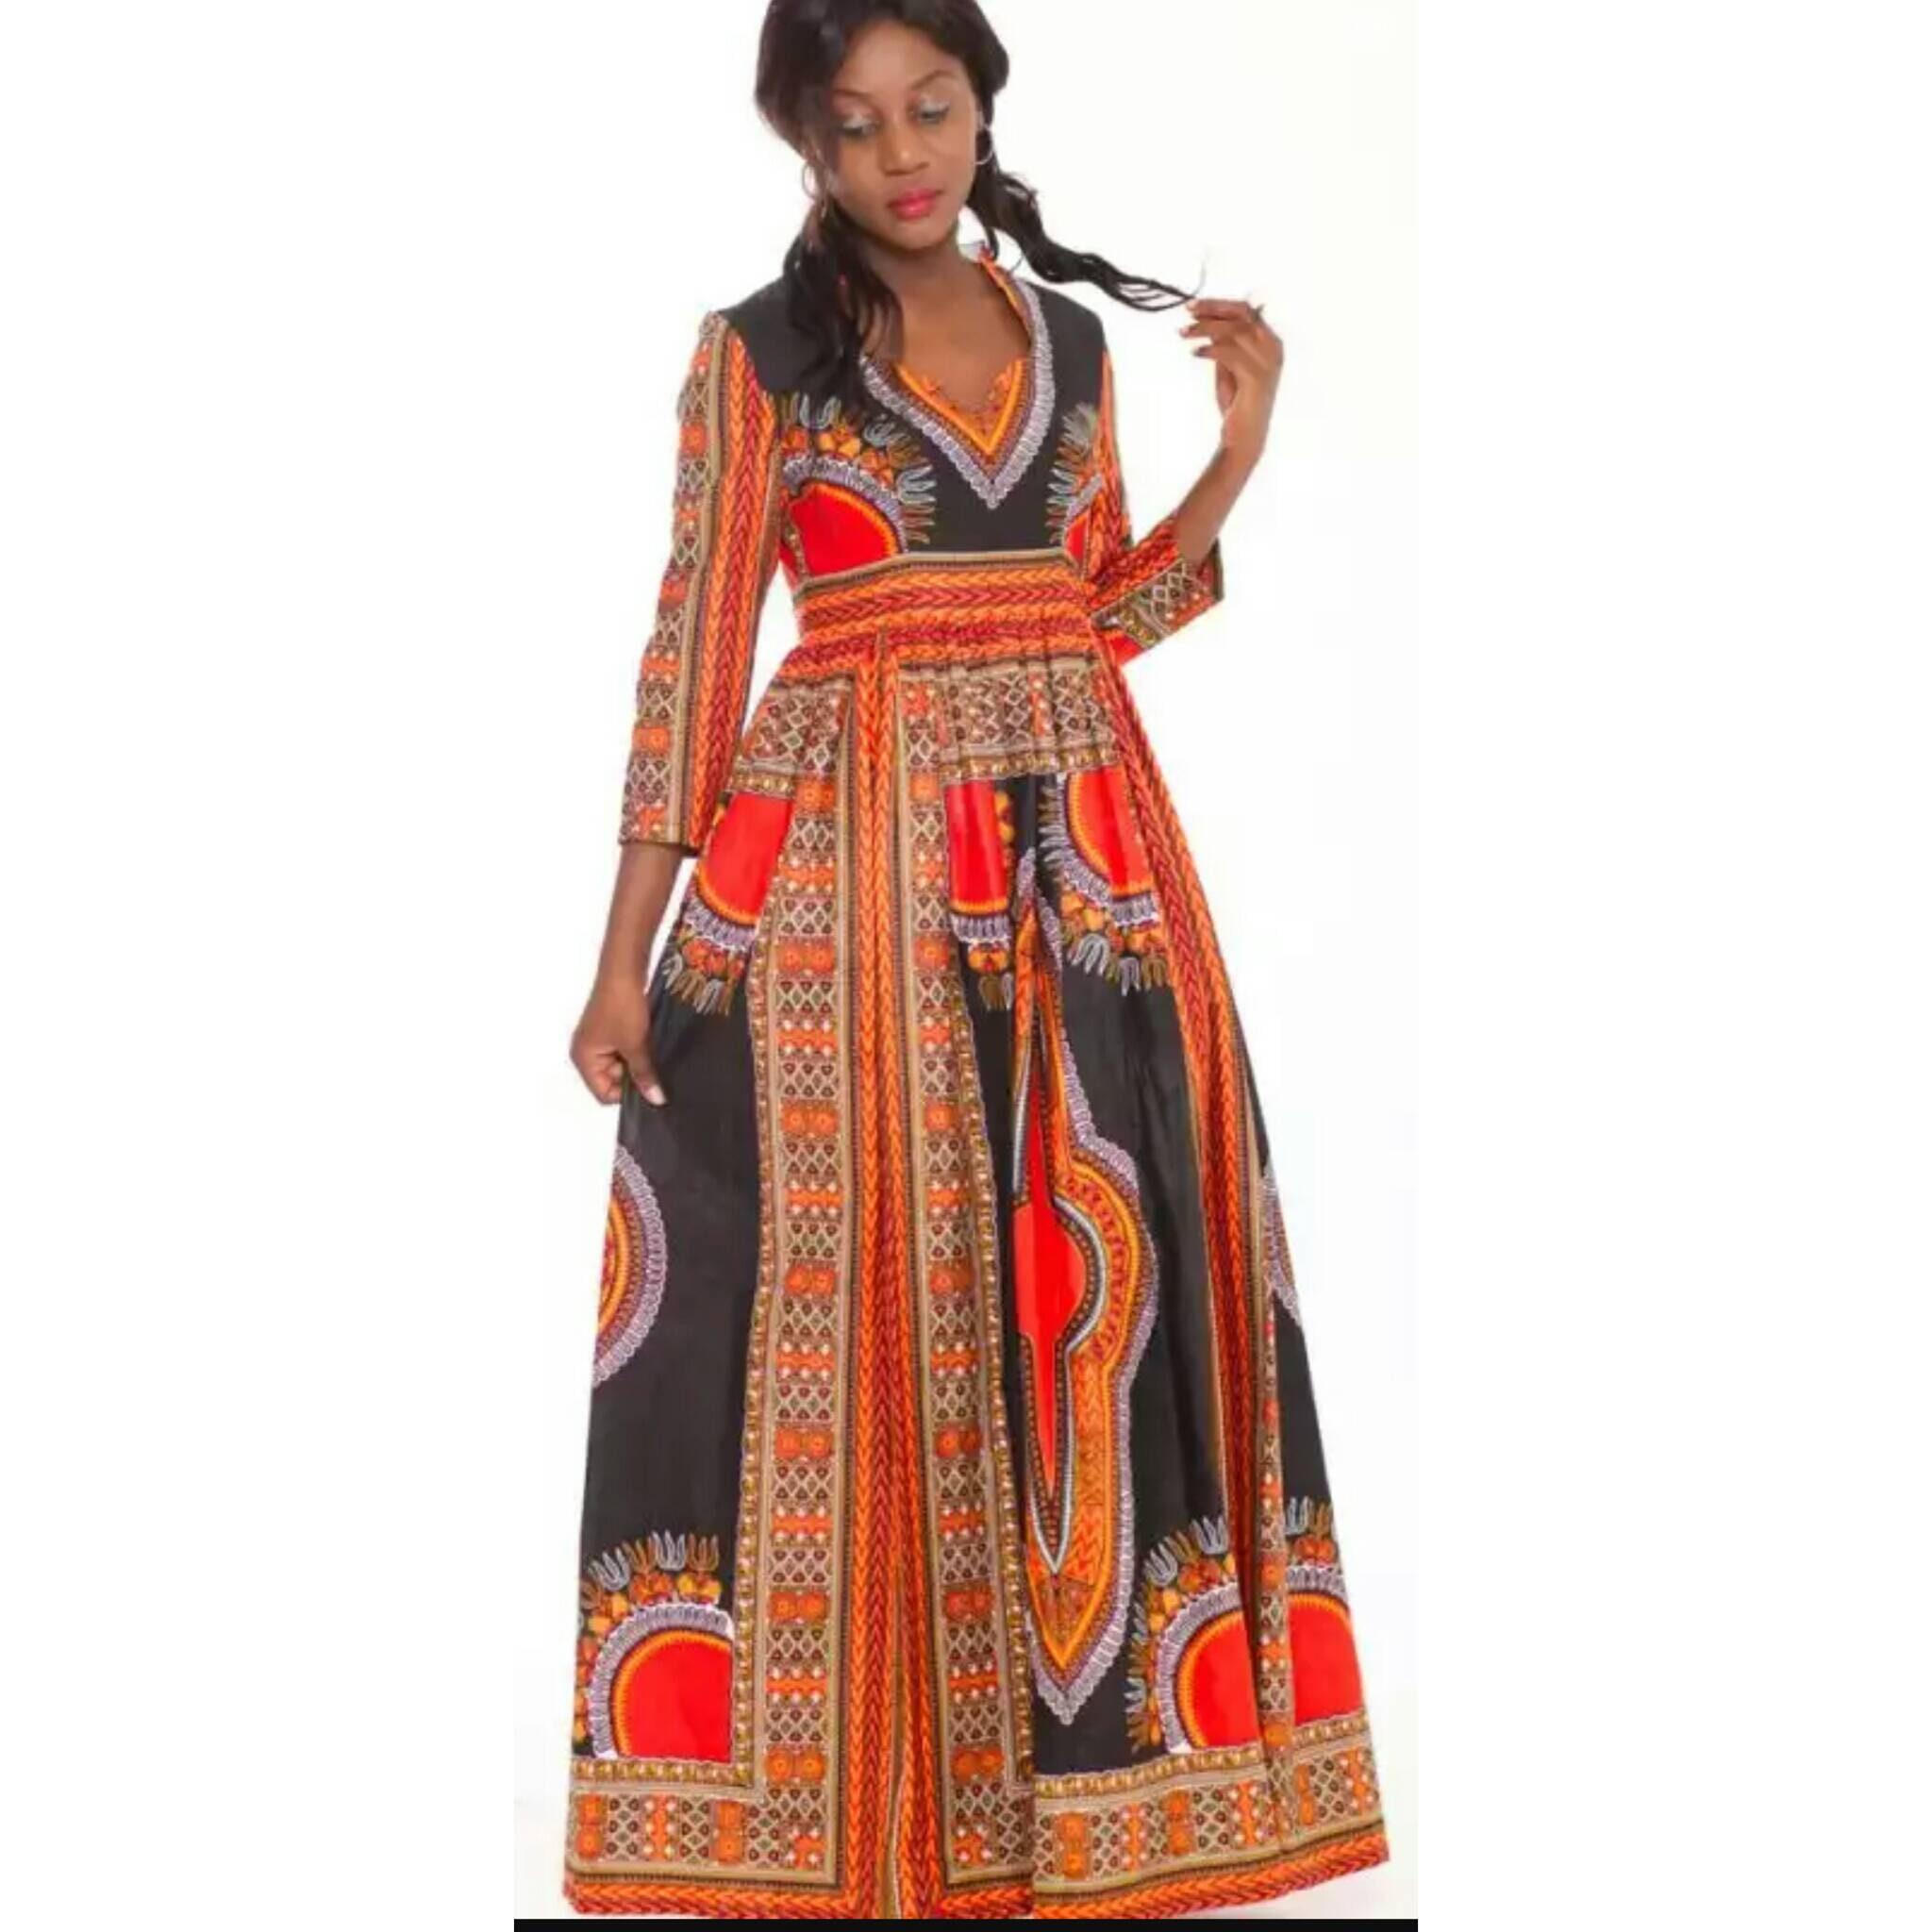 329701d4116 Dashiki dress dashiki maxi dress dashiki gown dashiki prom